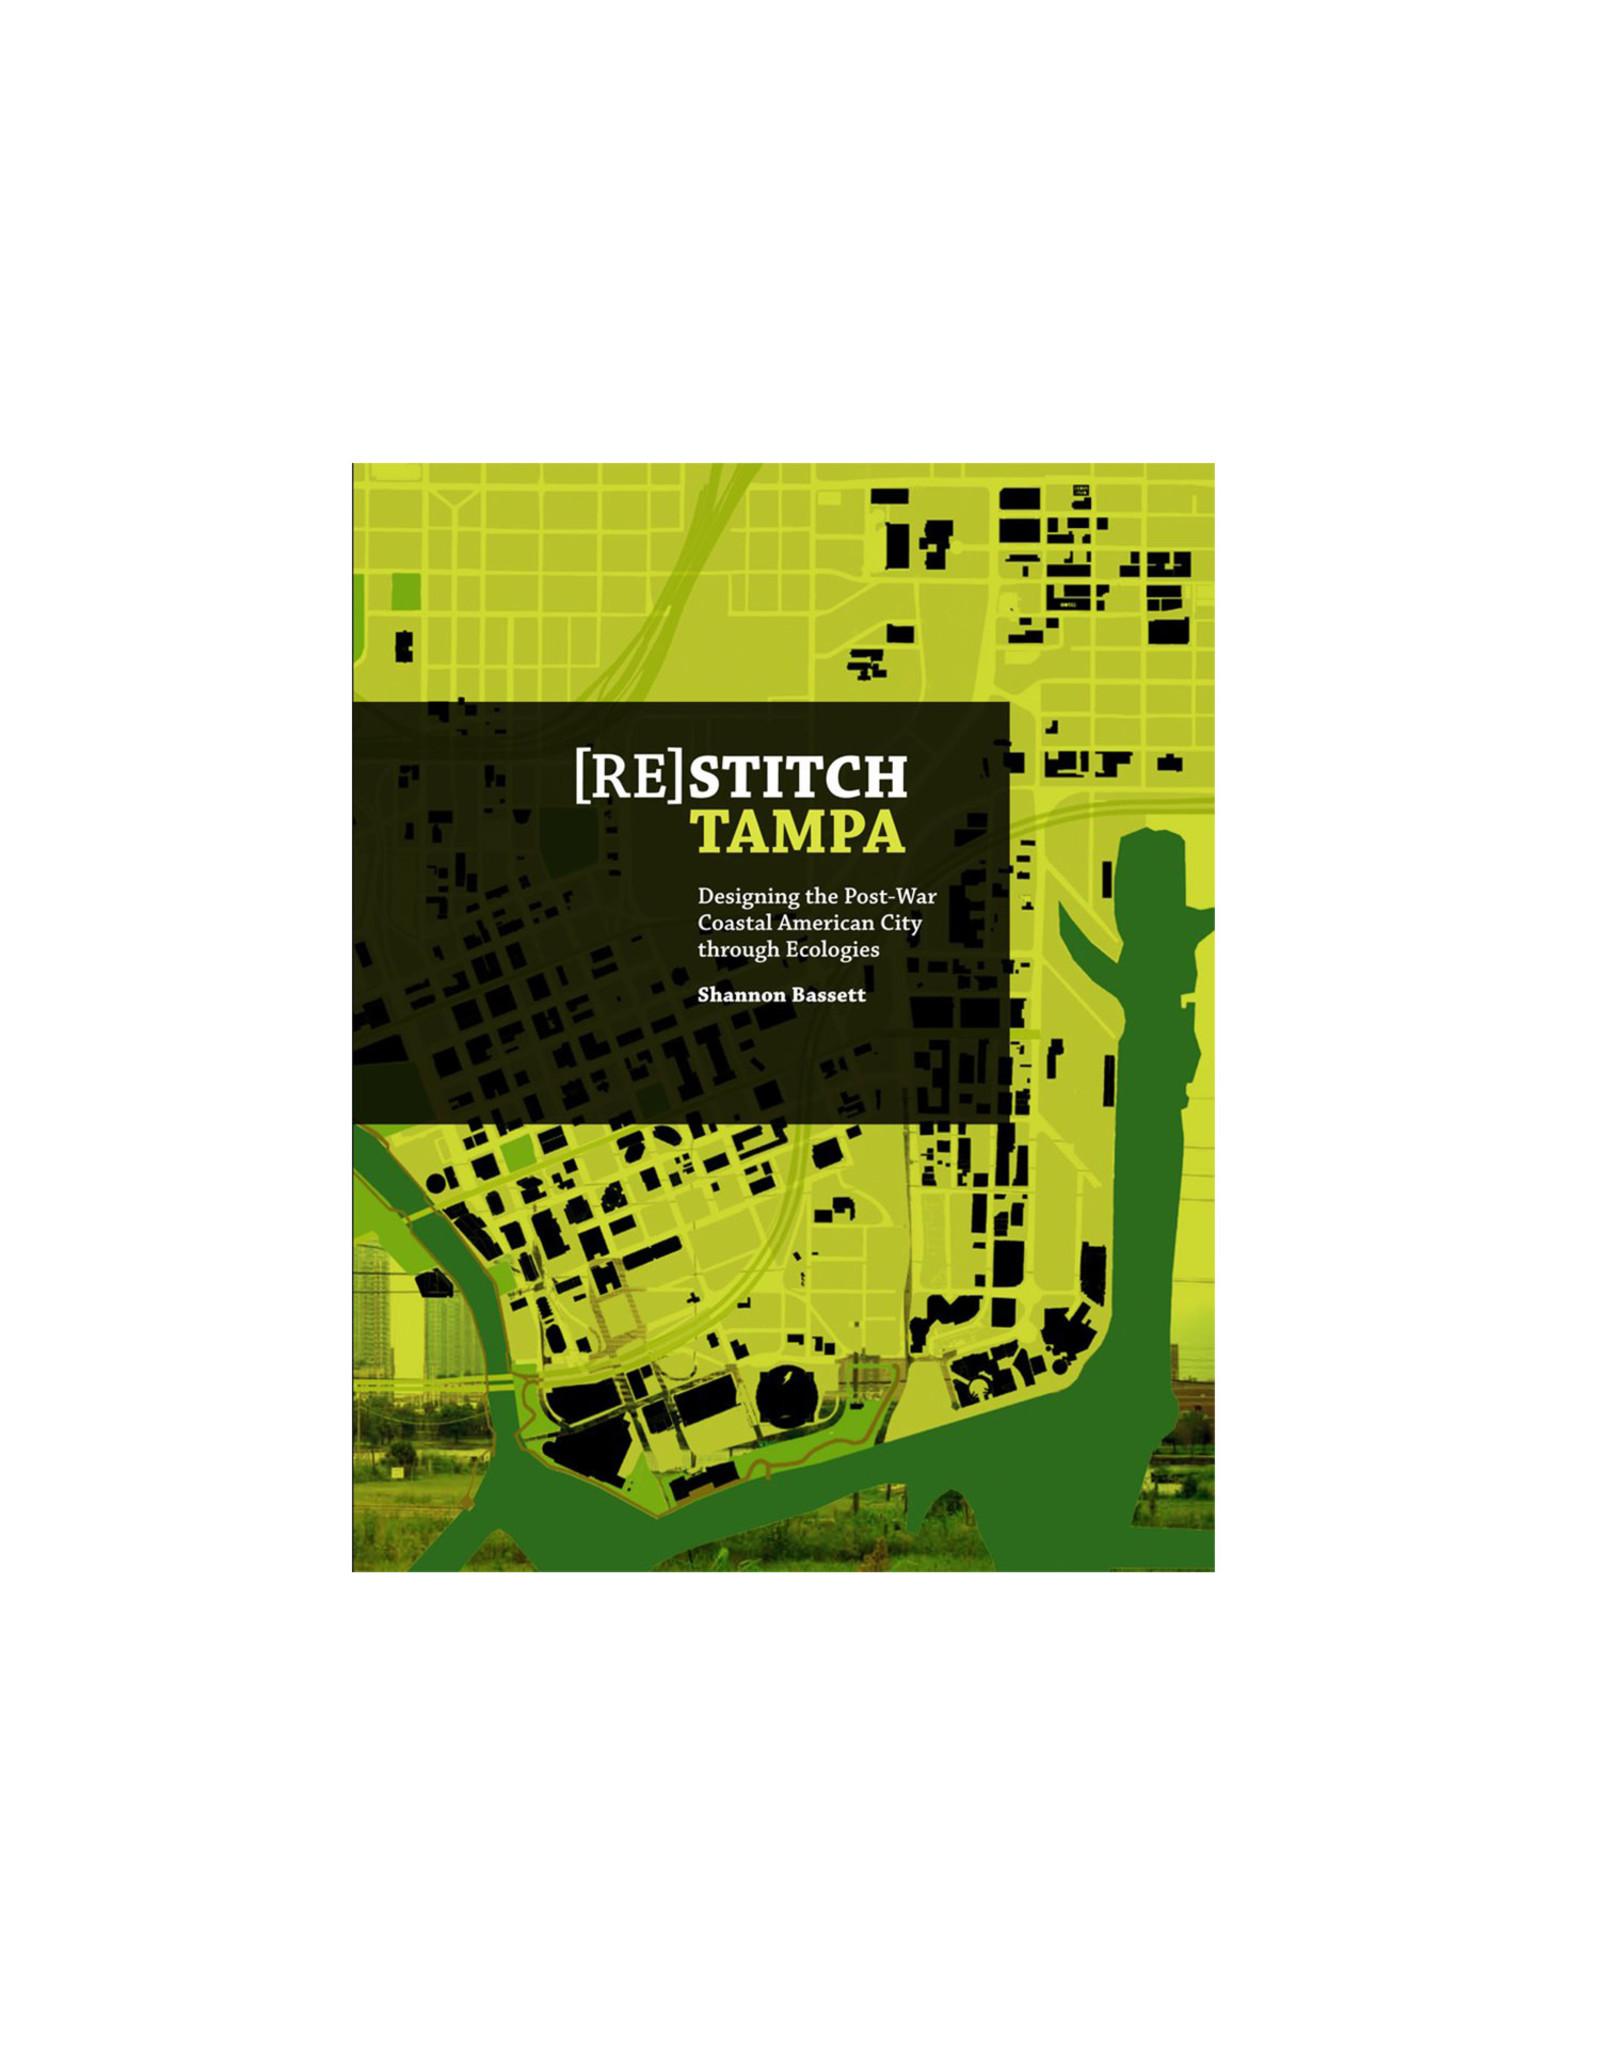 (Re)Stitch Tampa Designing the Post-War Coastal American City Through Ecologies